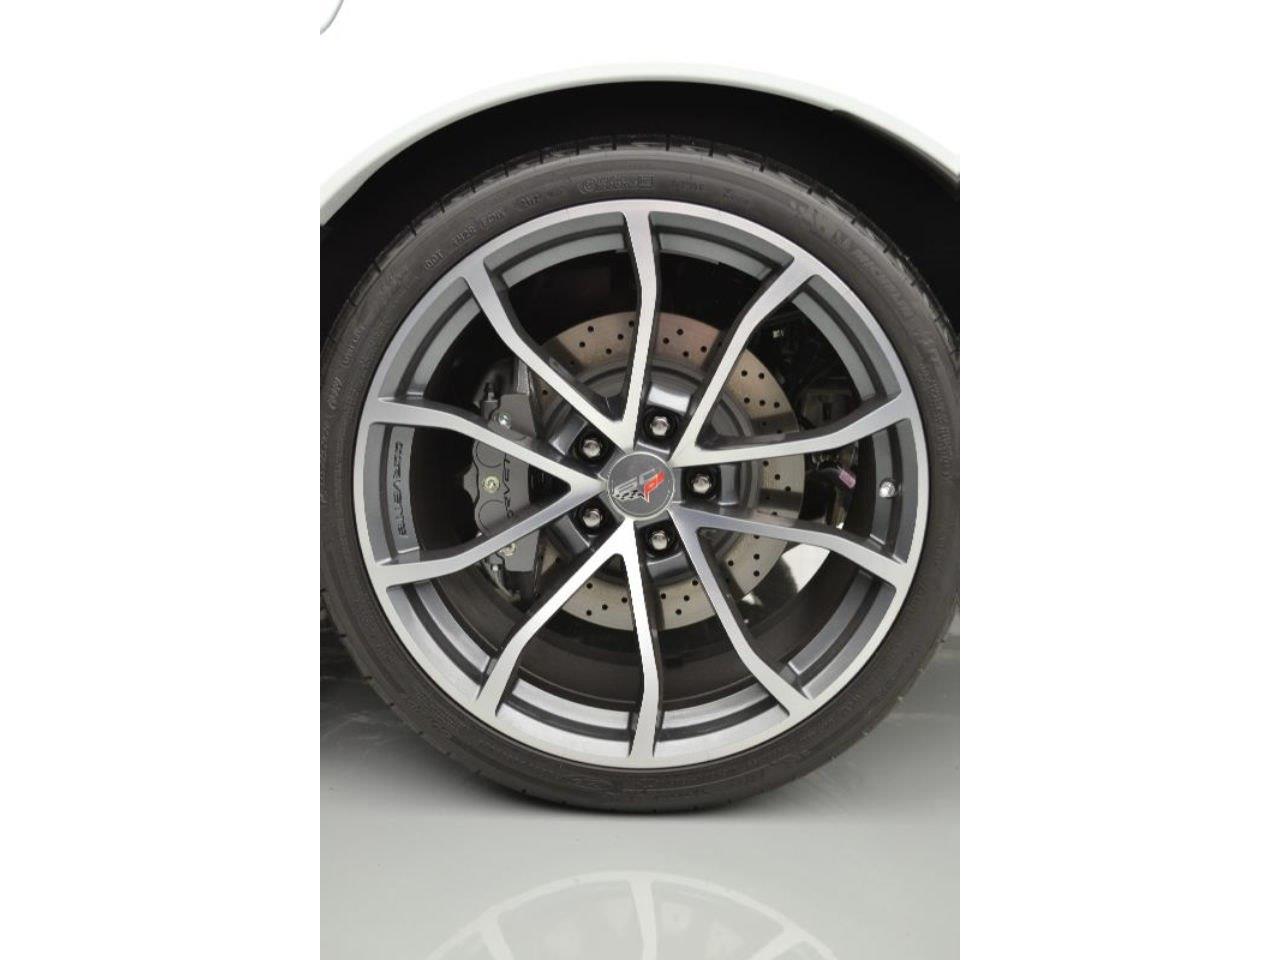 Large Picture of 2013 Corvette located in North Carolina - $96,000.00 - 8QFQ